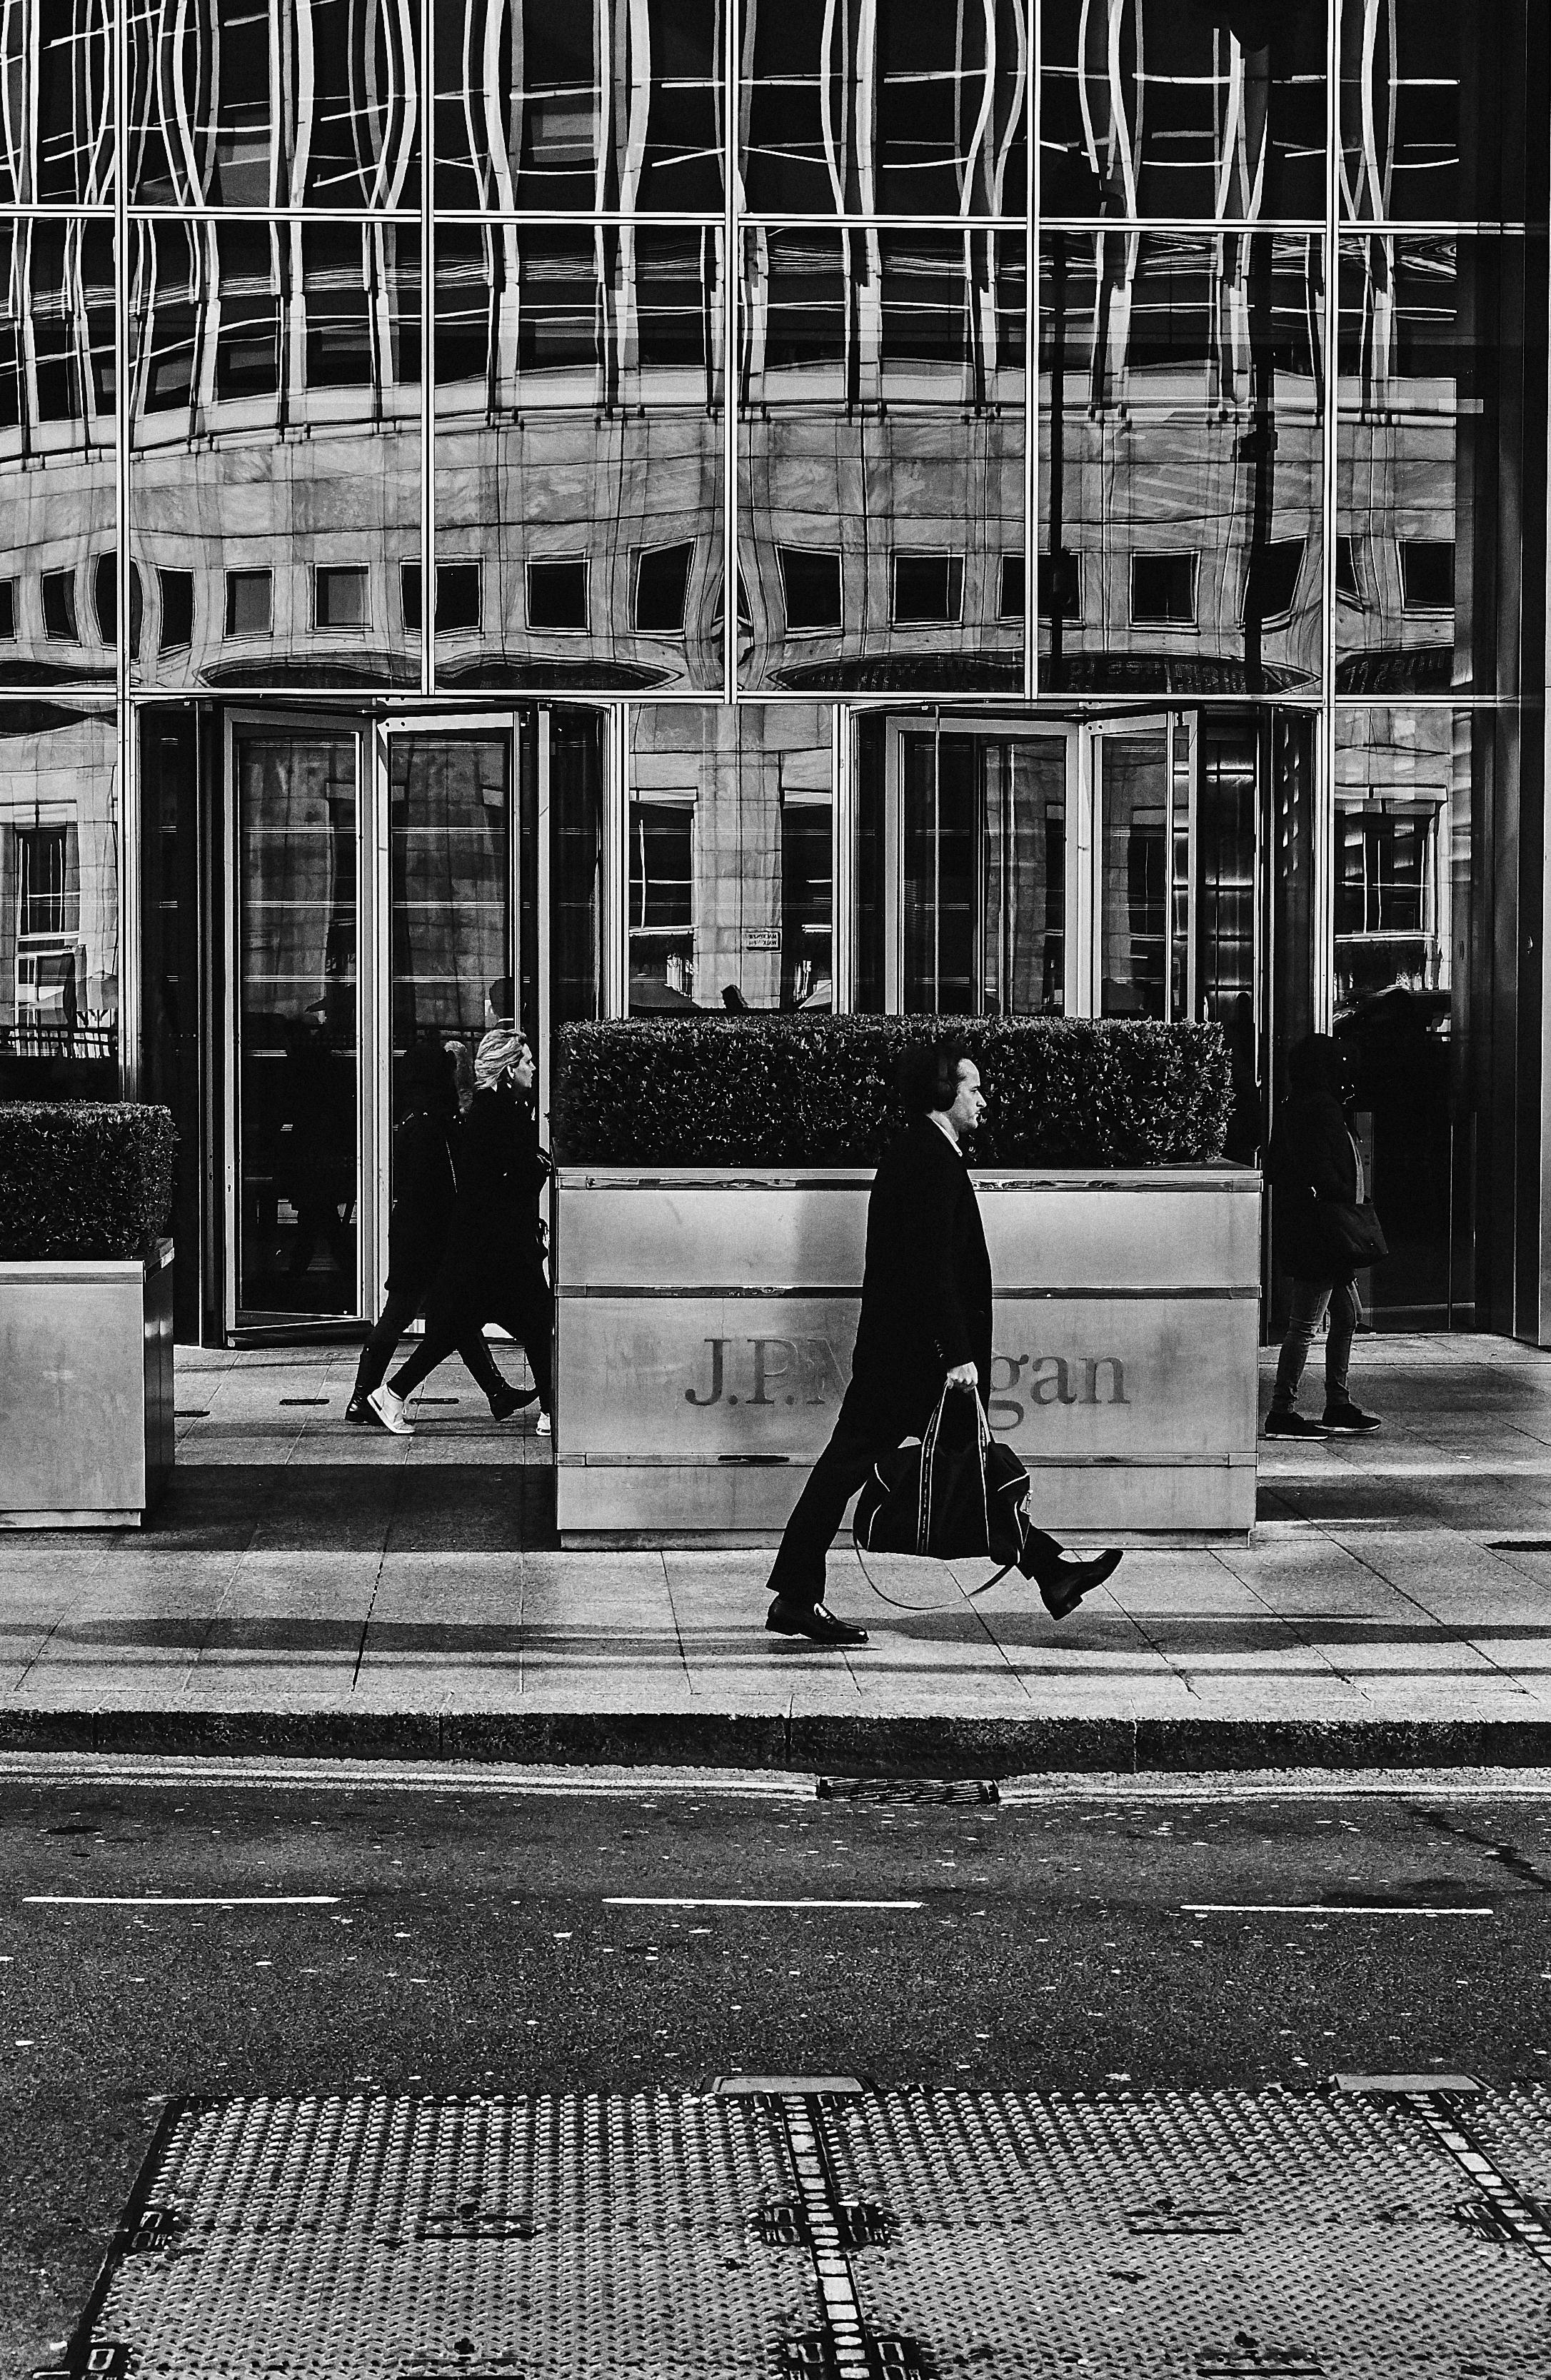 London_City_Commuters_25_03_19_0832 1.jpg